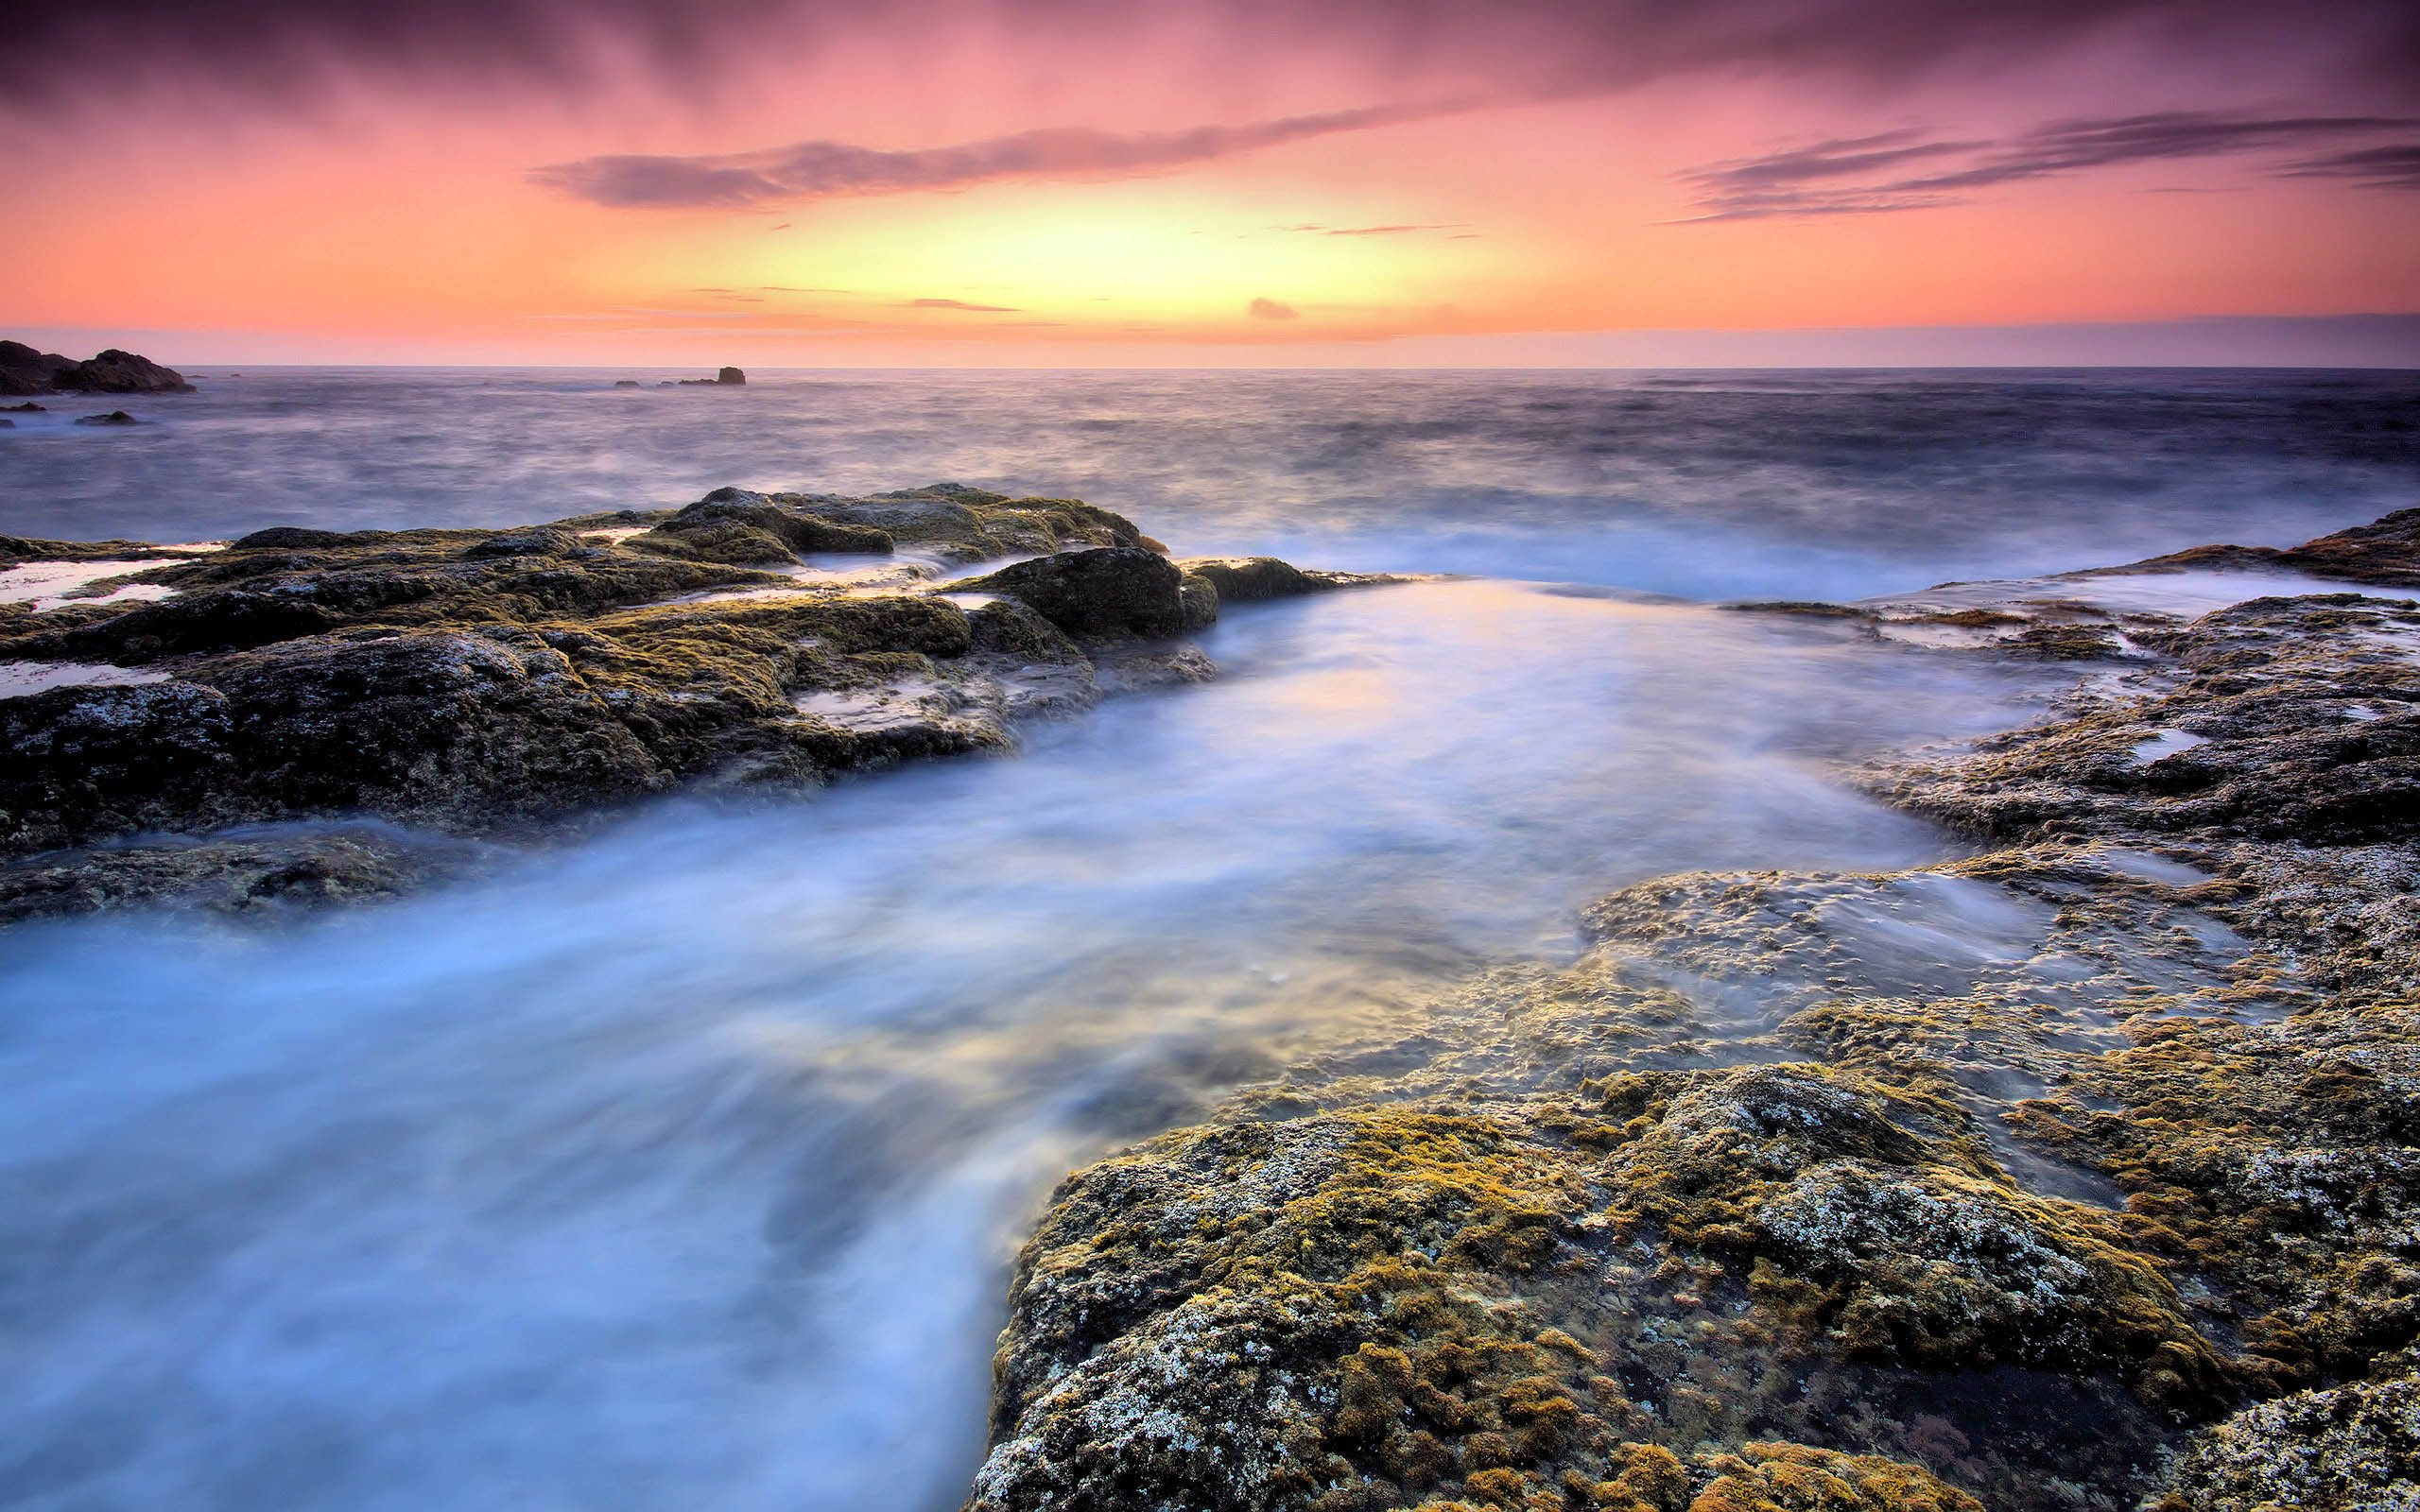 HD Wallpapers Coastal marine